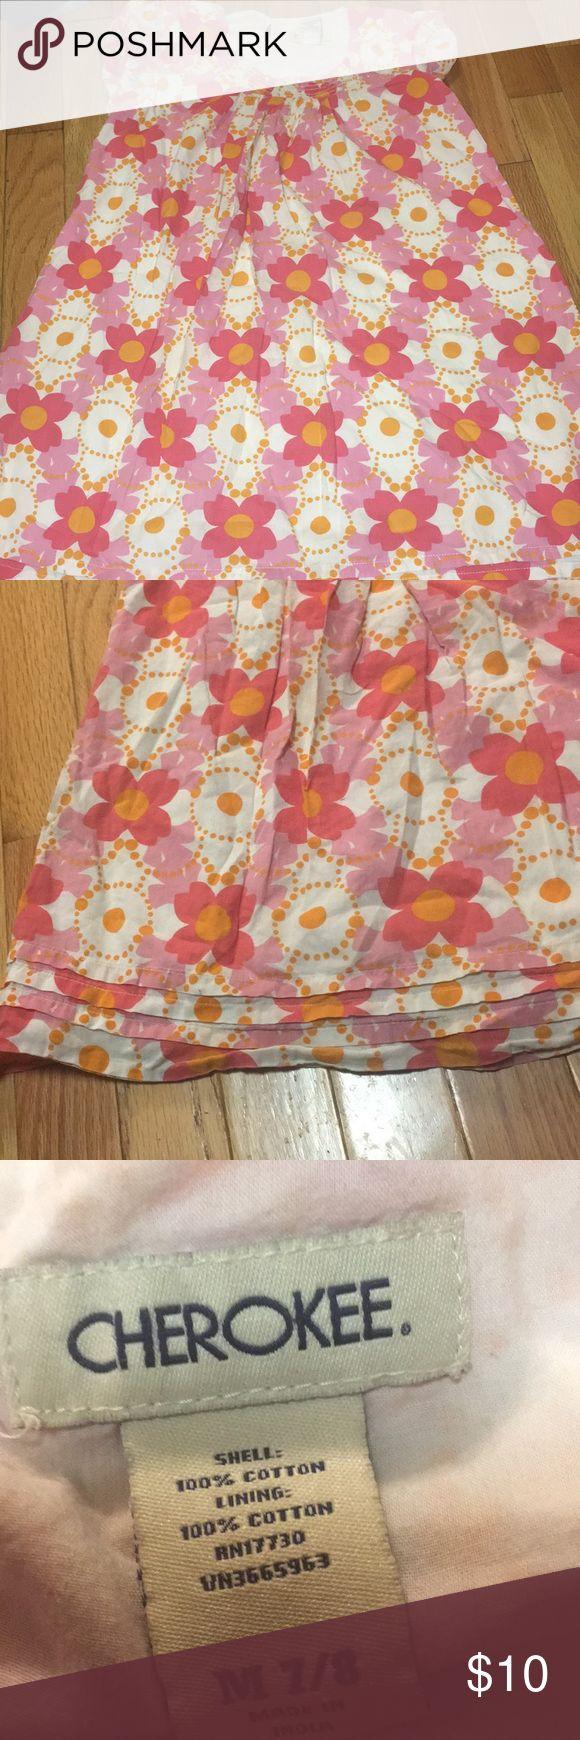 Girls dress Girls dress Cherokee brand size 7/8 some fading Dresses Casual